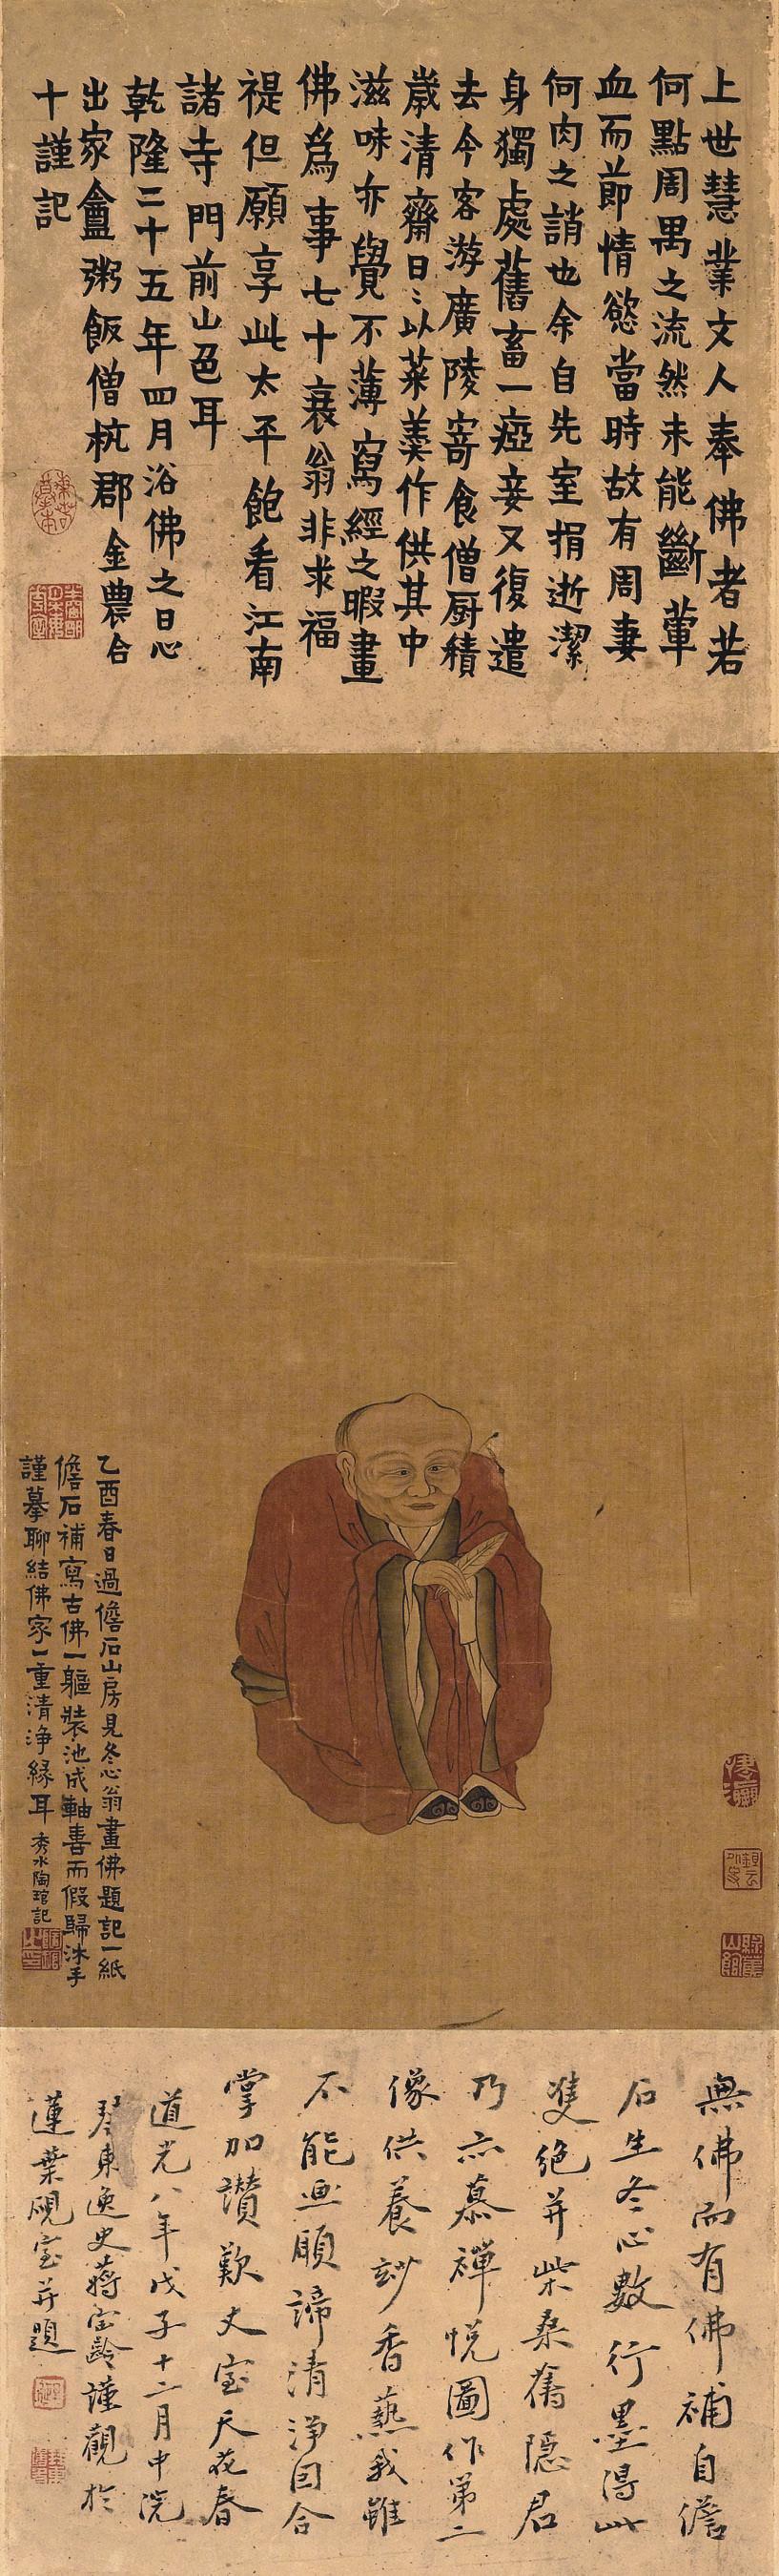 TAO GUAN (1794-1849)